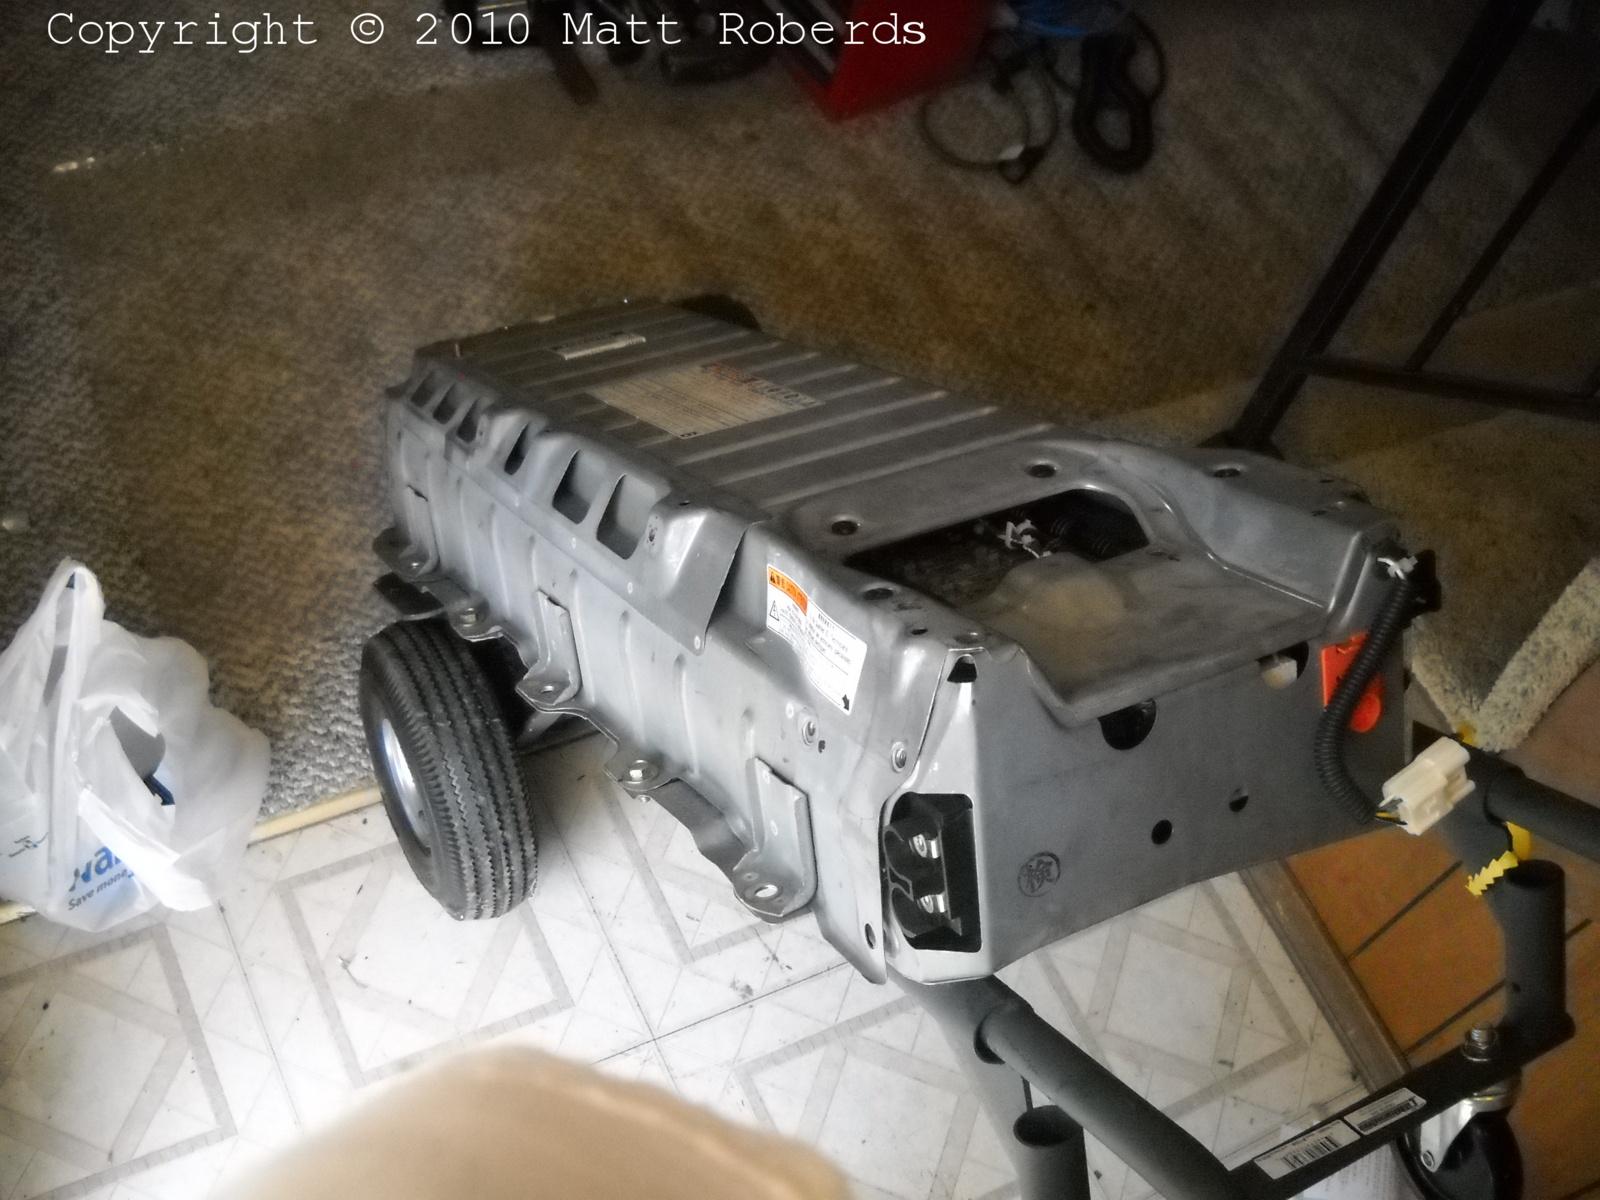 2001 Toyota Prius NHW11 battery swap